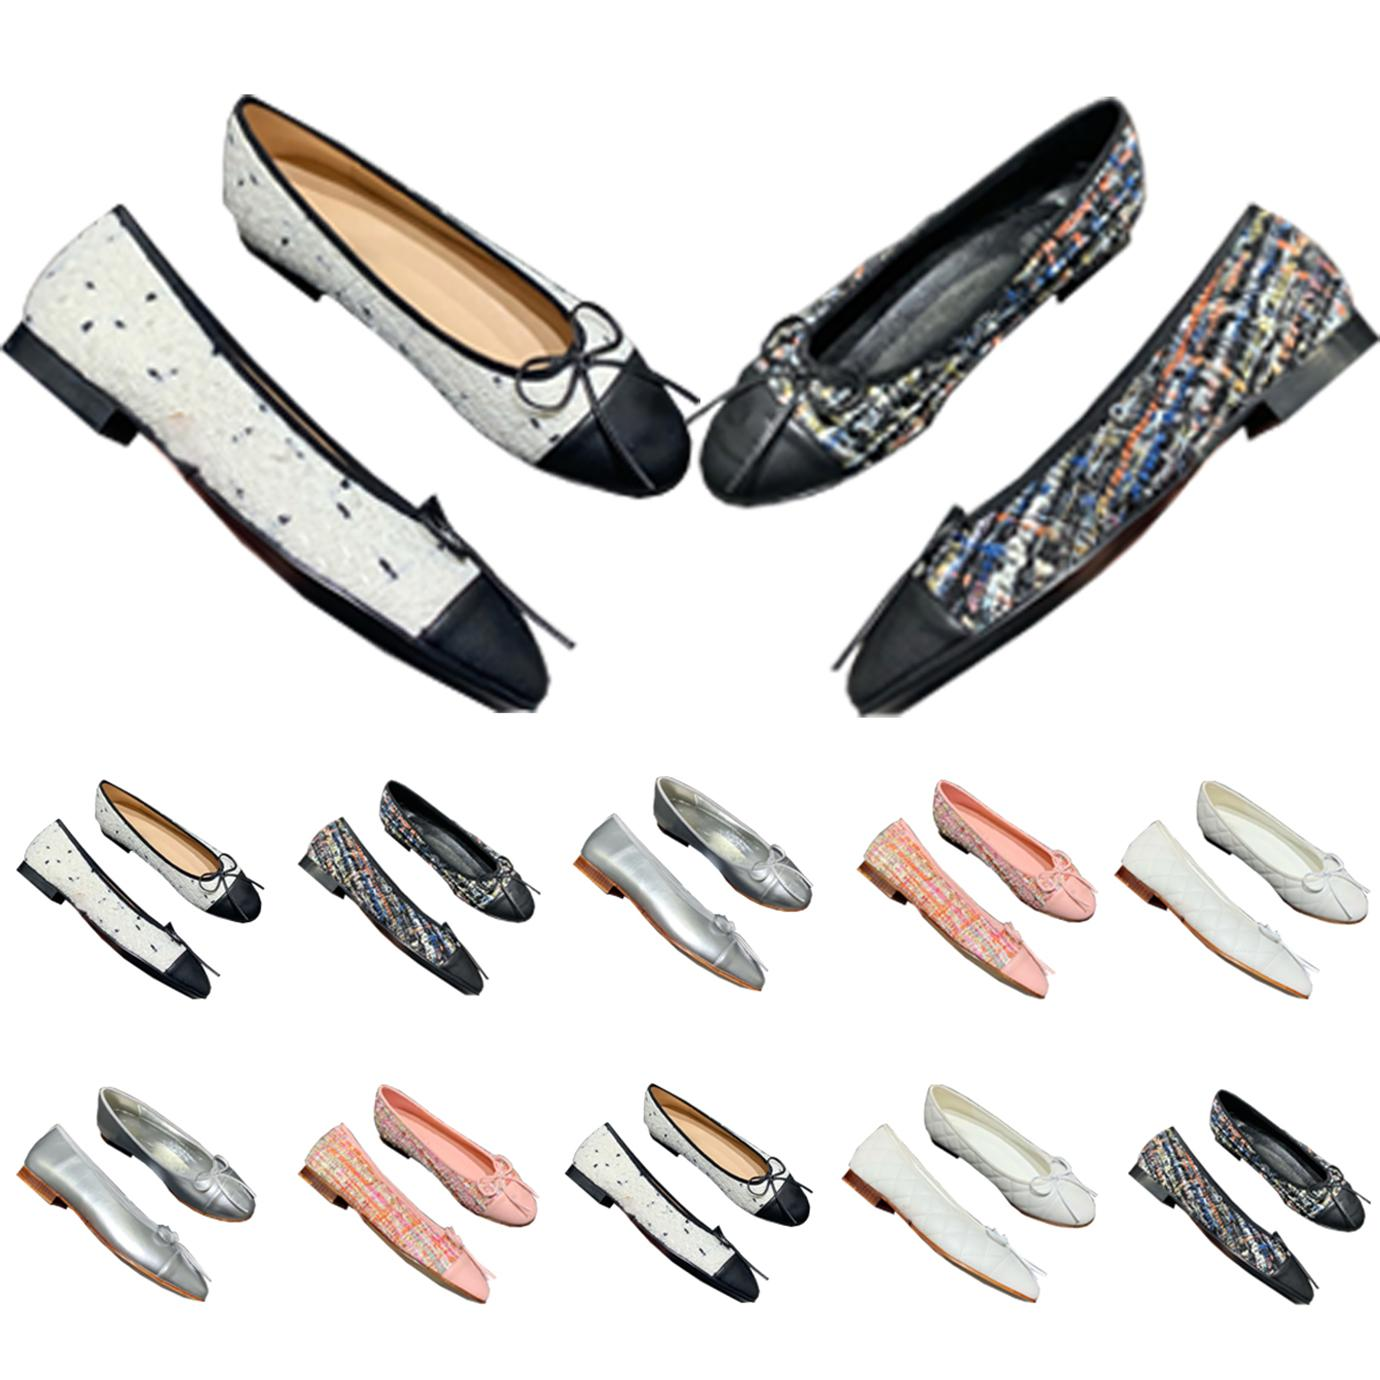 Sandálias Mulheres Pontos dedos Slides Sandália Luxurys Designers Shoes Paris Chinelos Senhora Sexy Verão Vista Lisa Flat Lowers